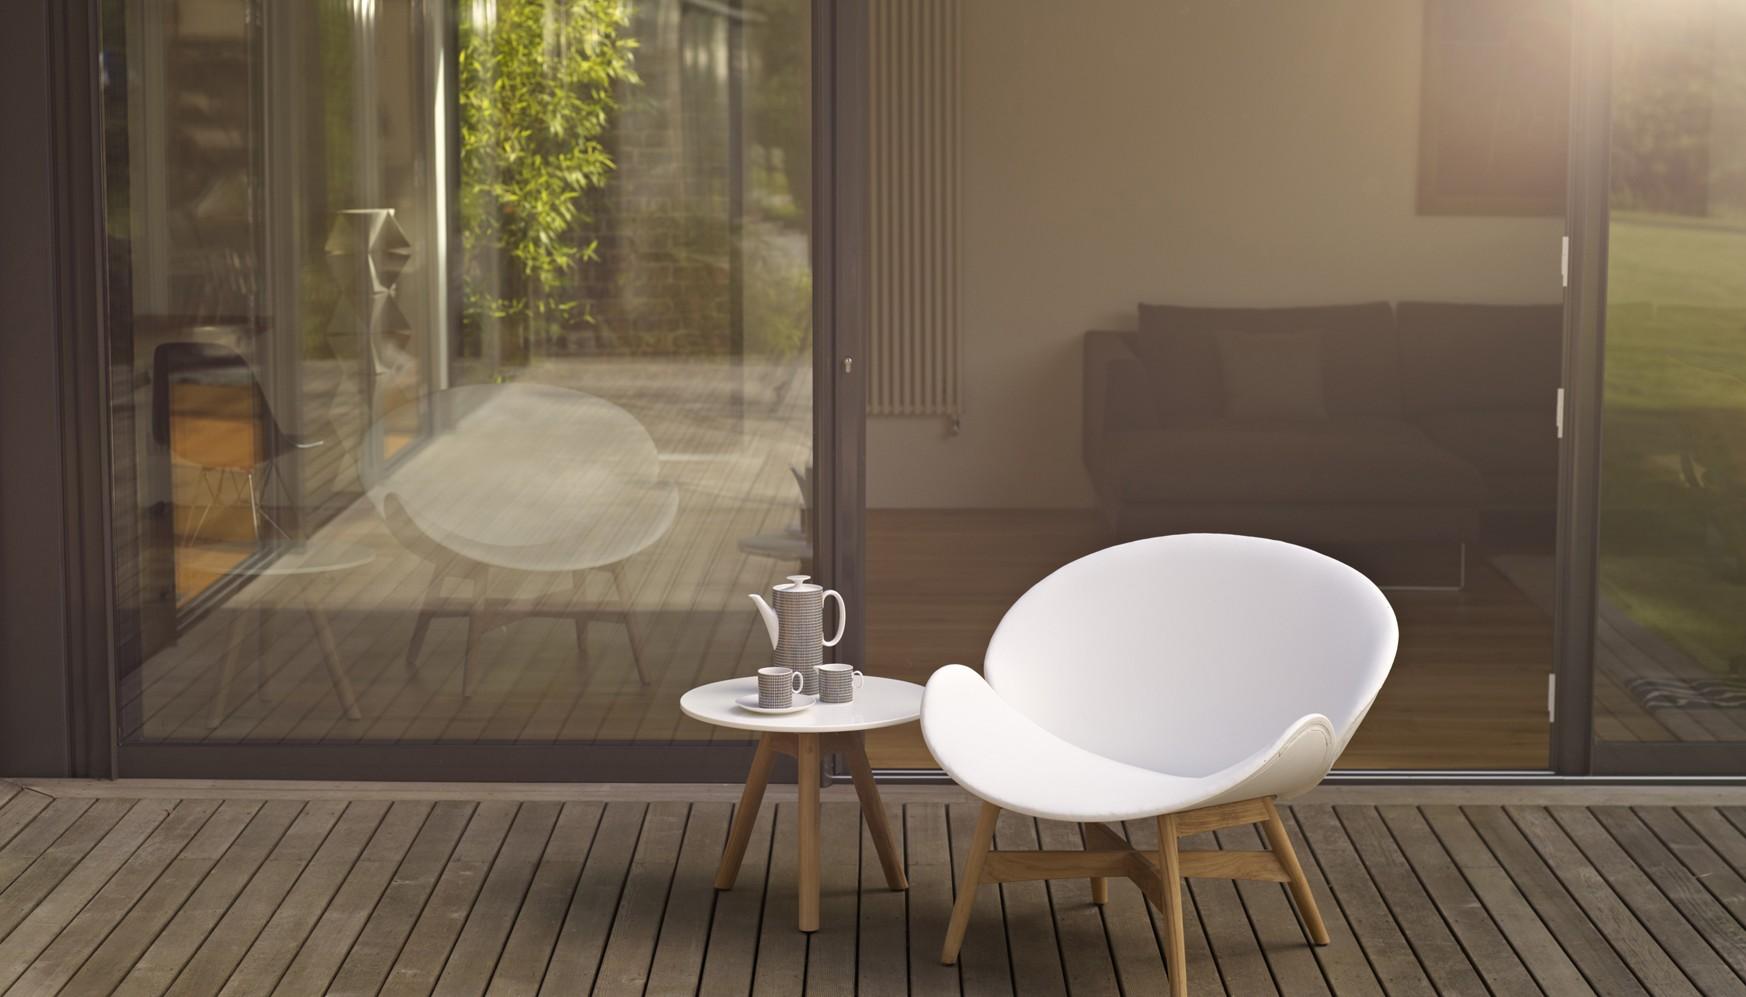 Mobilier de jardin design discount